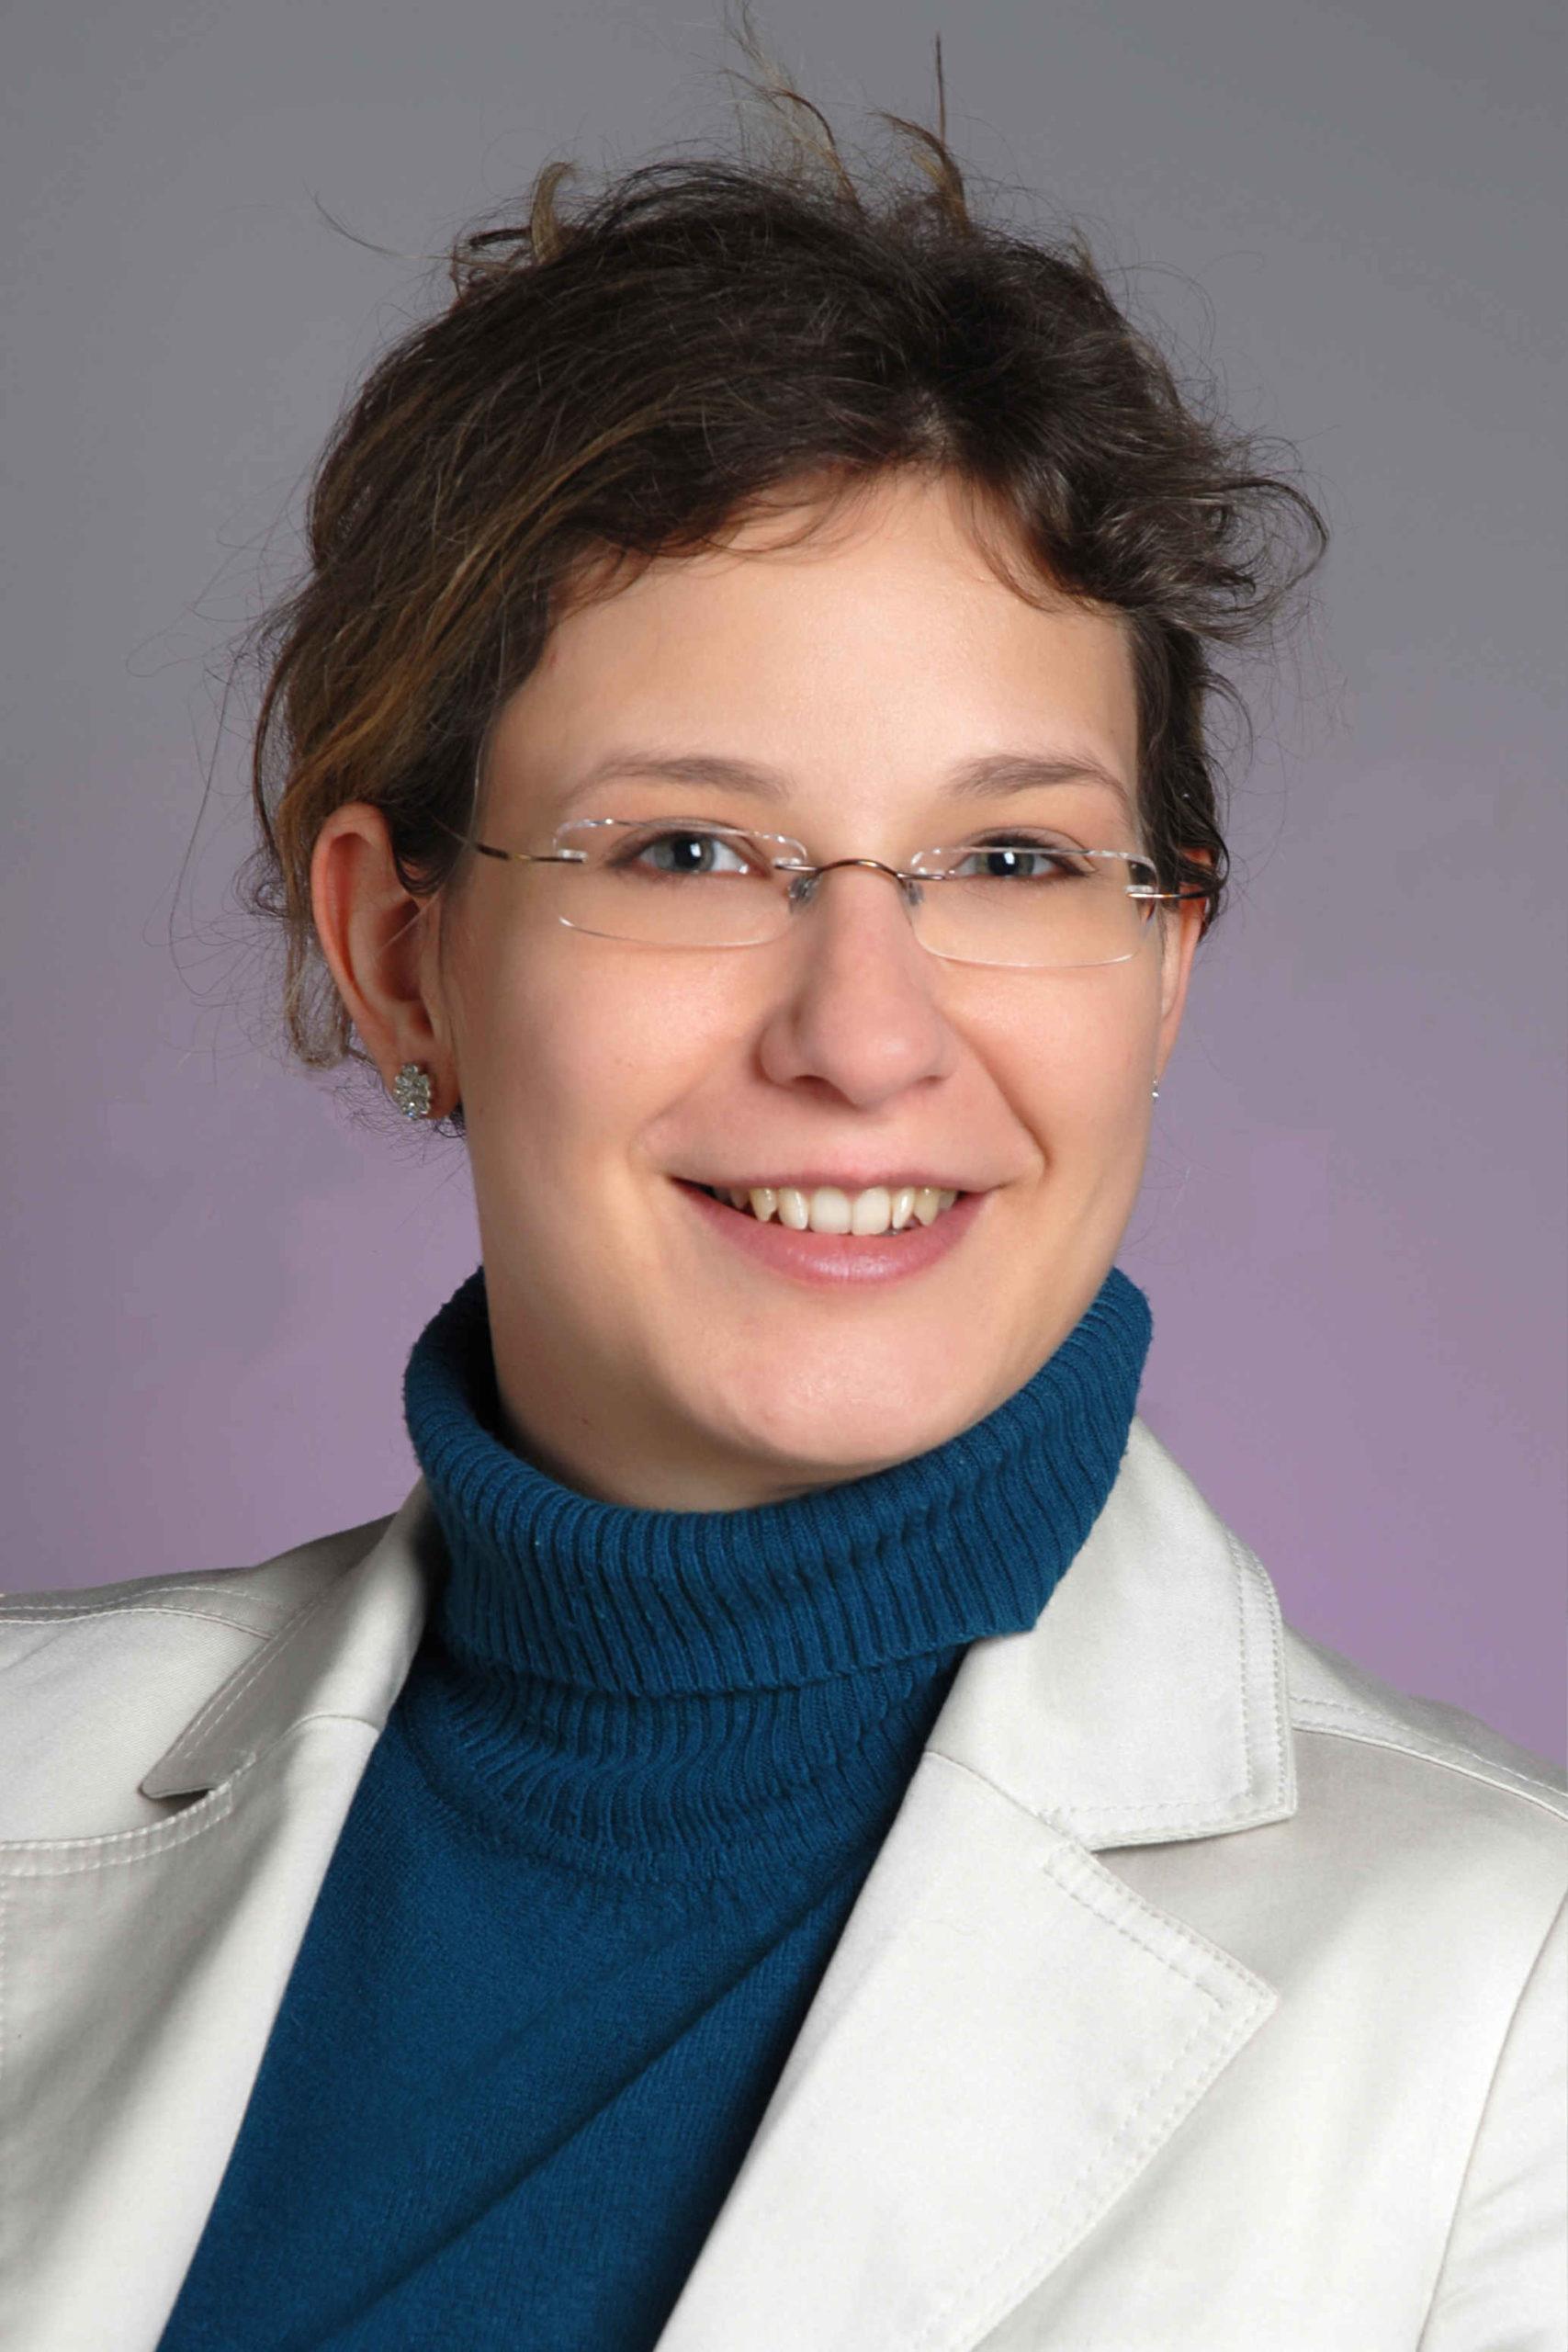 Elisabeth Rosenfellner